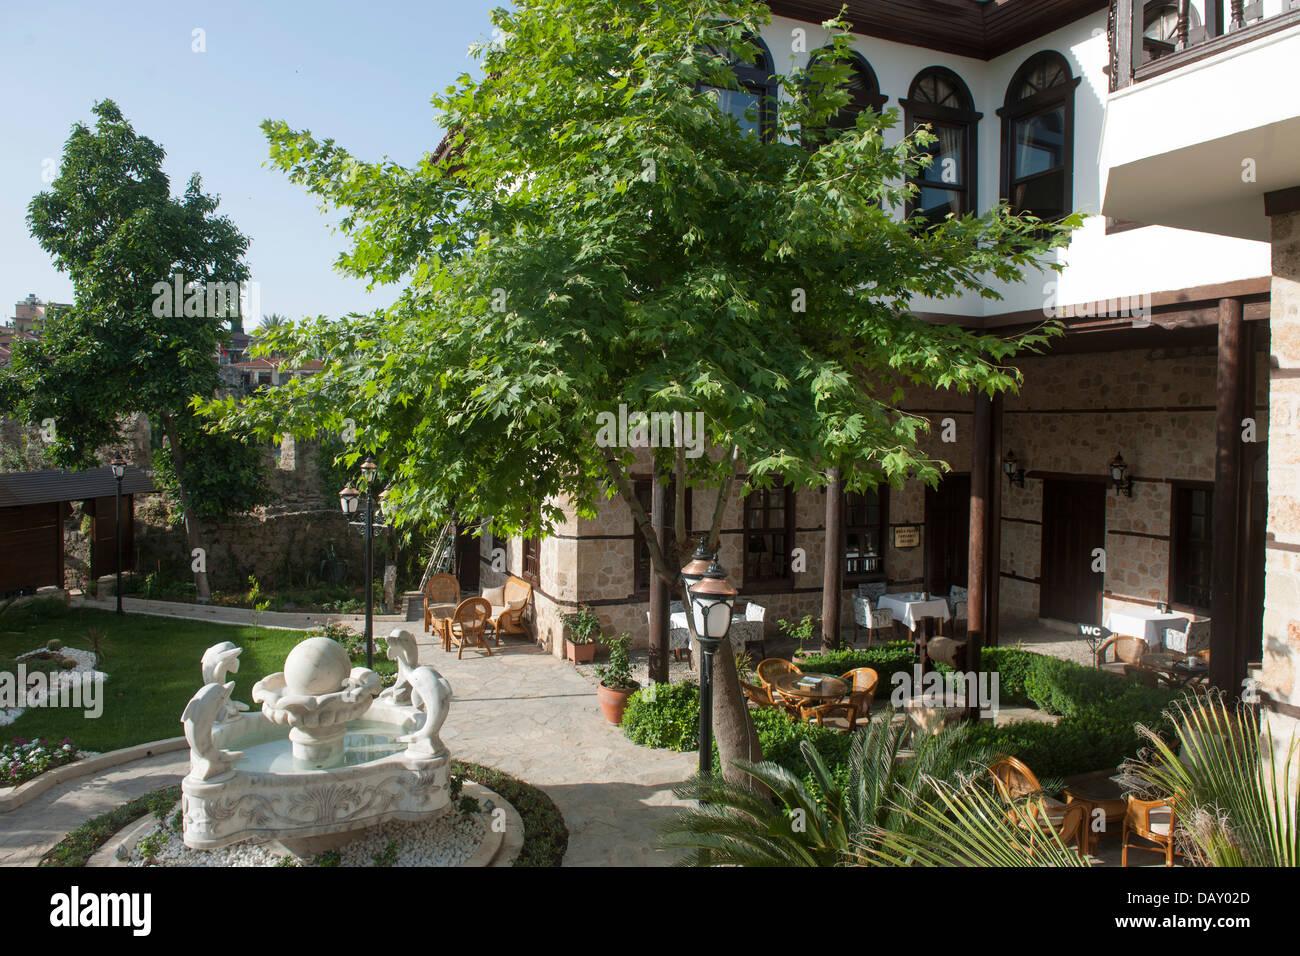 Türkei, Antalya Stadt, Altstadt, Restaurant Gizli Bahce   Stock Image